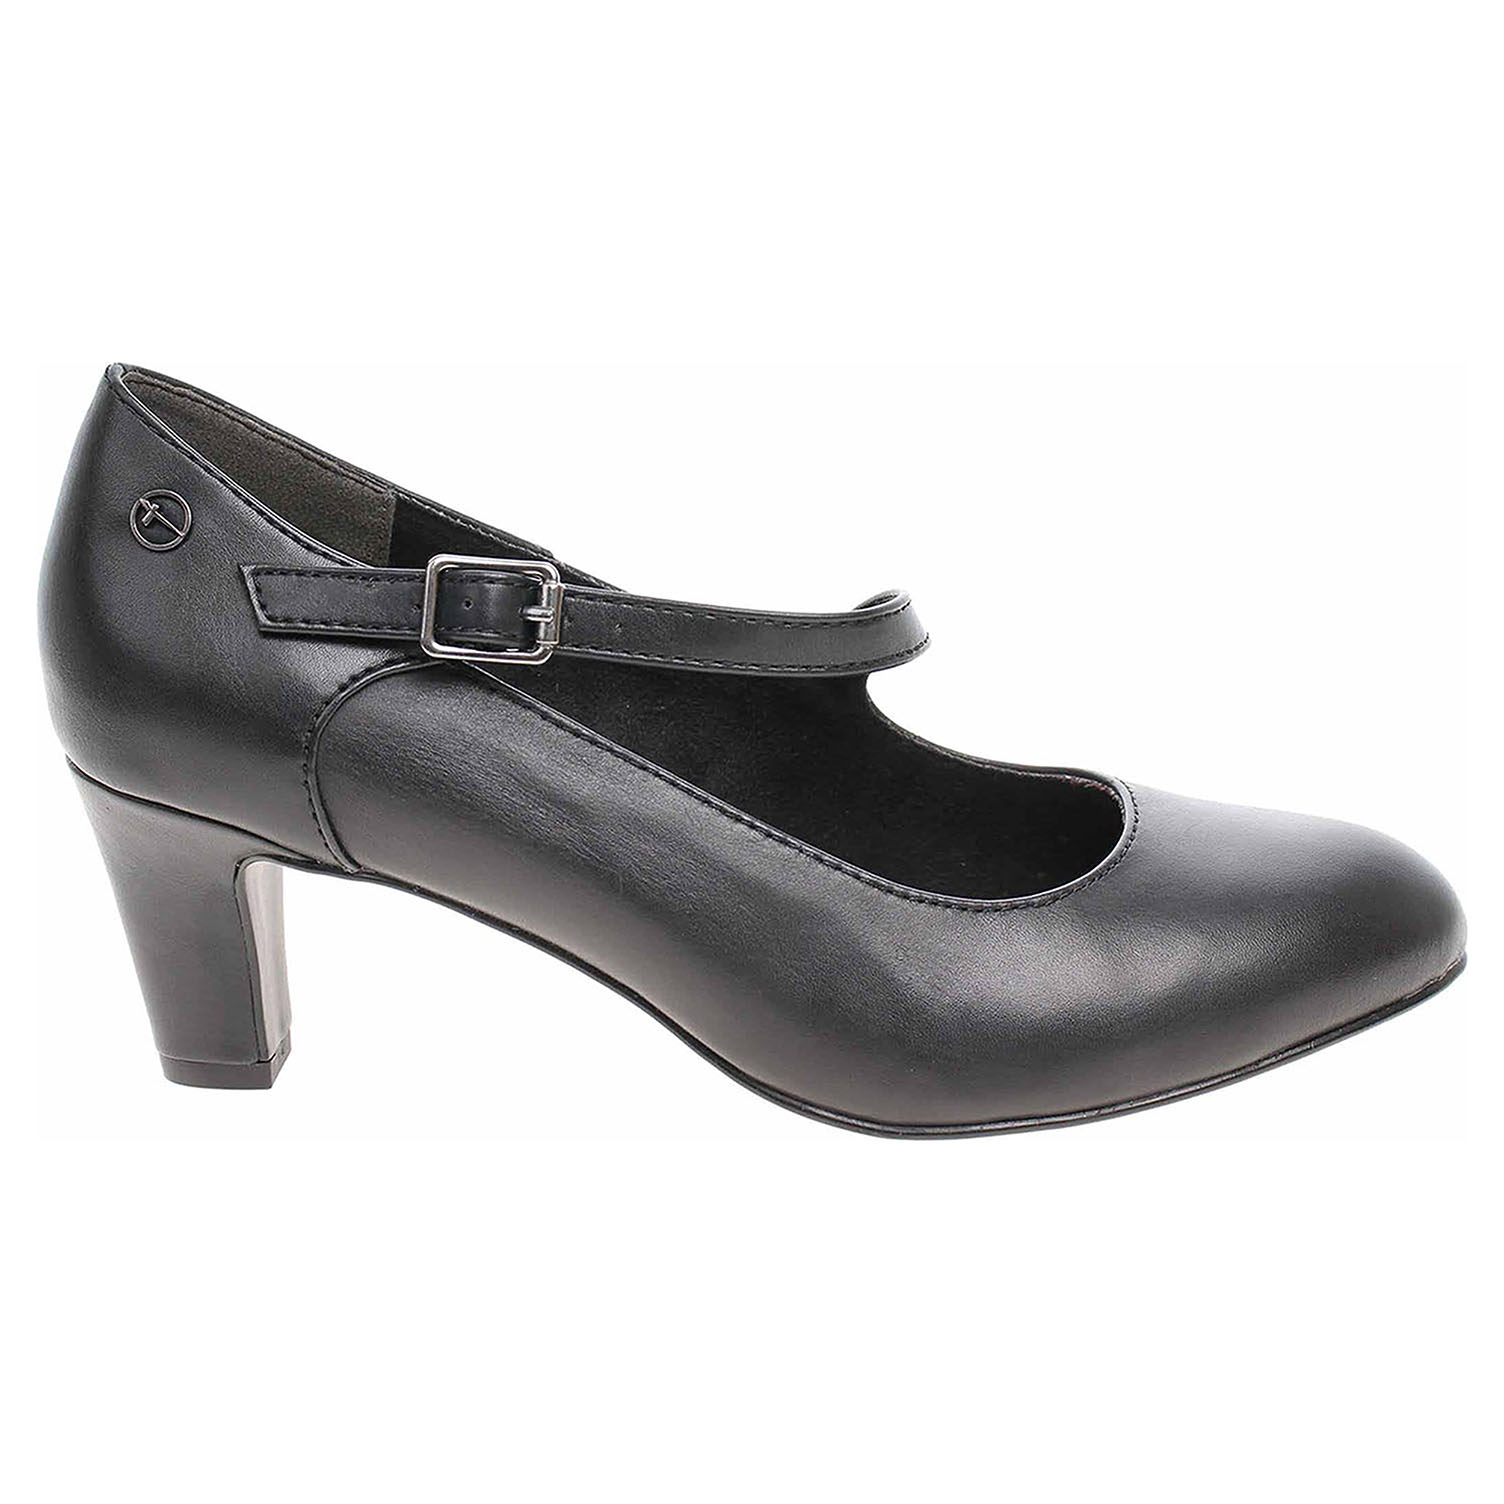 824e85ac25 Tamaris dámské lodičky 1-24402-21 black leather 1-1-24402-